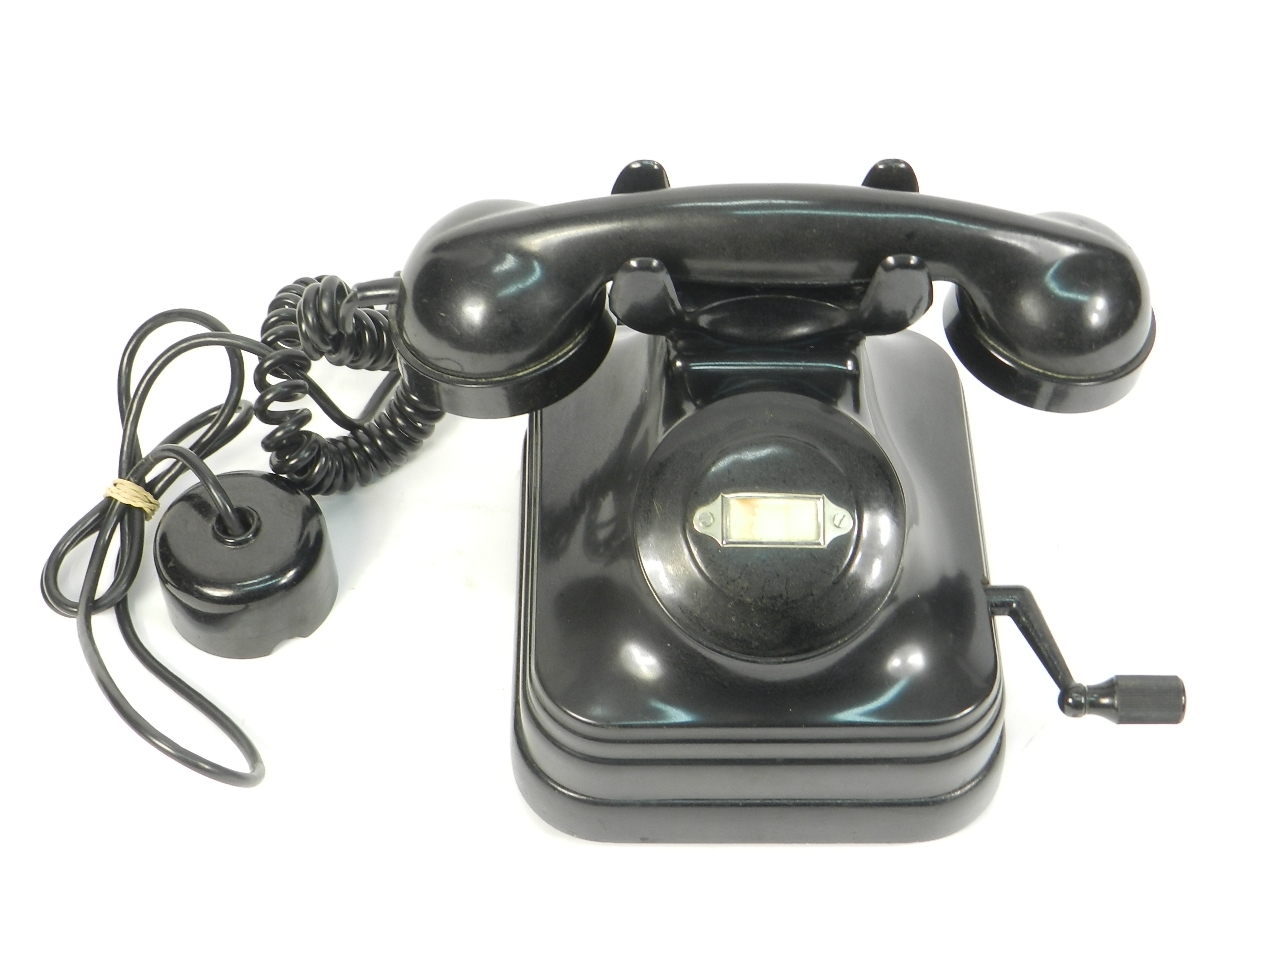 Imagen TELEFONO CON MAGNETO AÑO 1940 41430